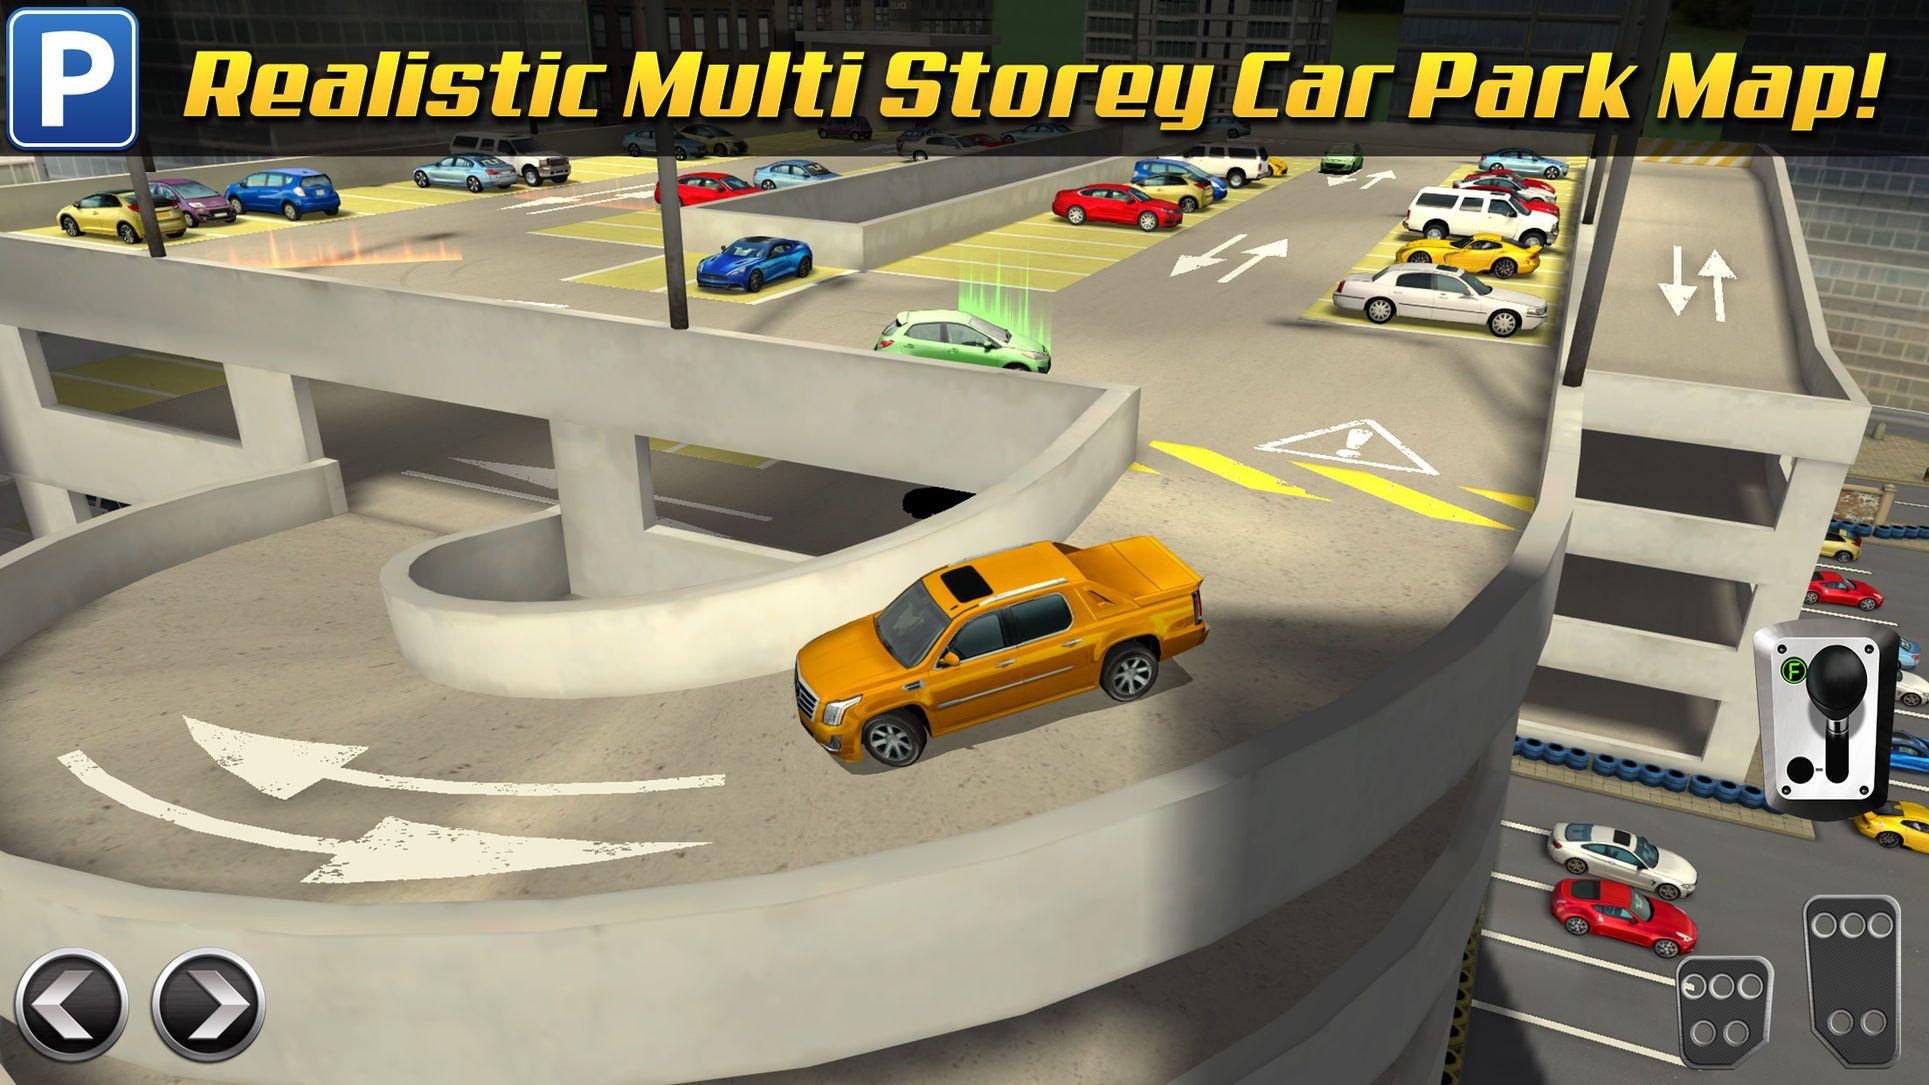 Real Driving Games >> Multi Level 3 Car Parking Game Real Driving Test Run Racing Run